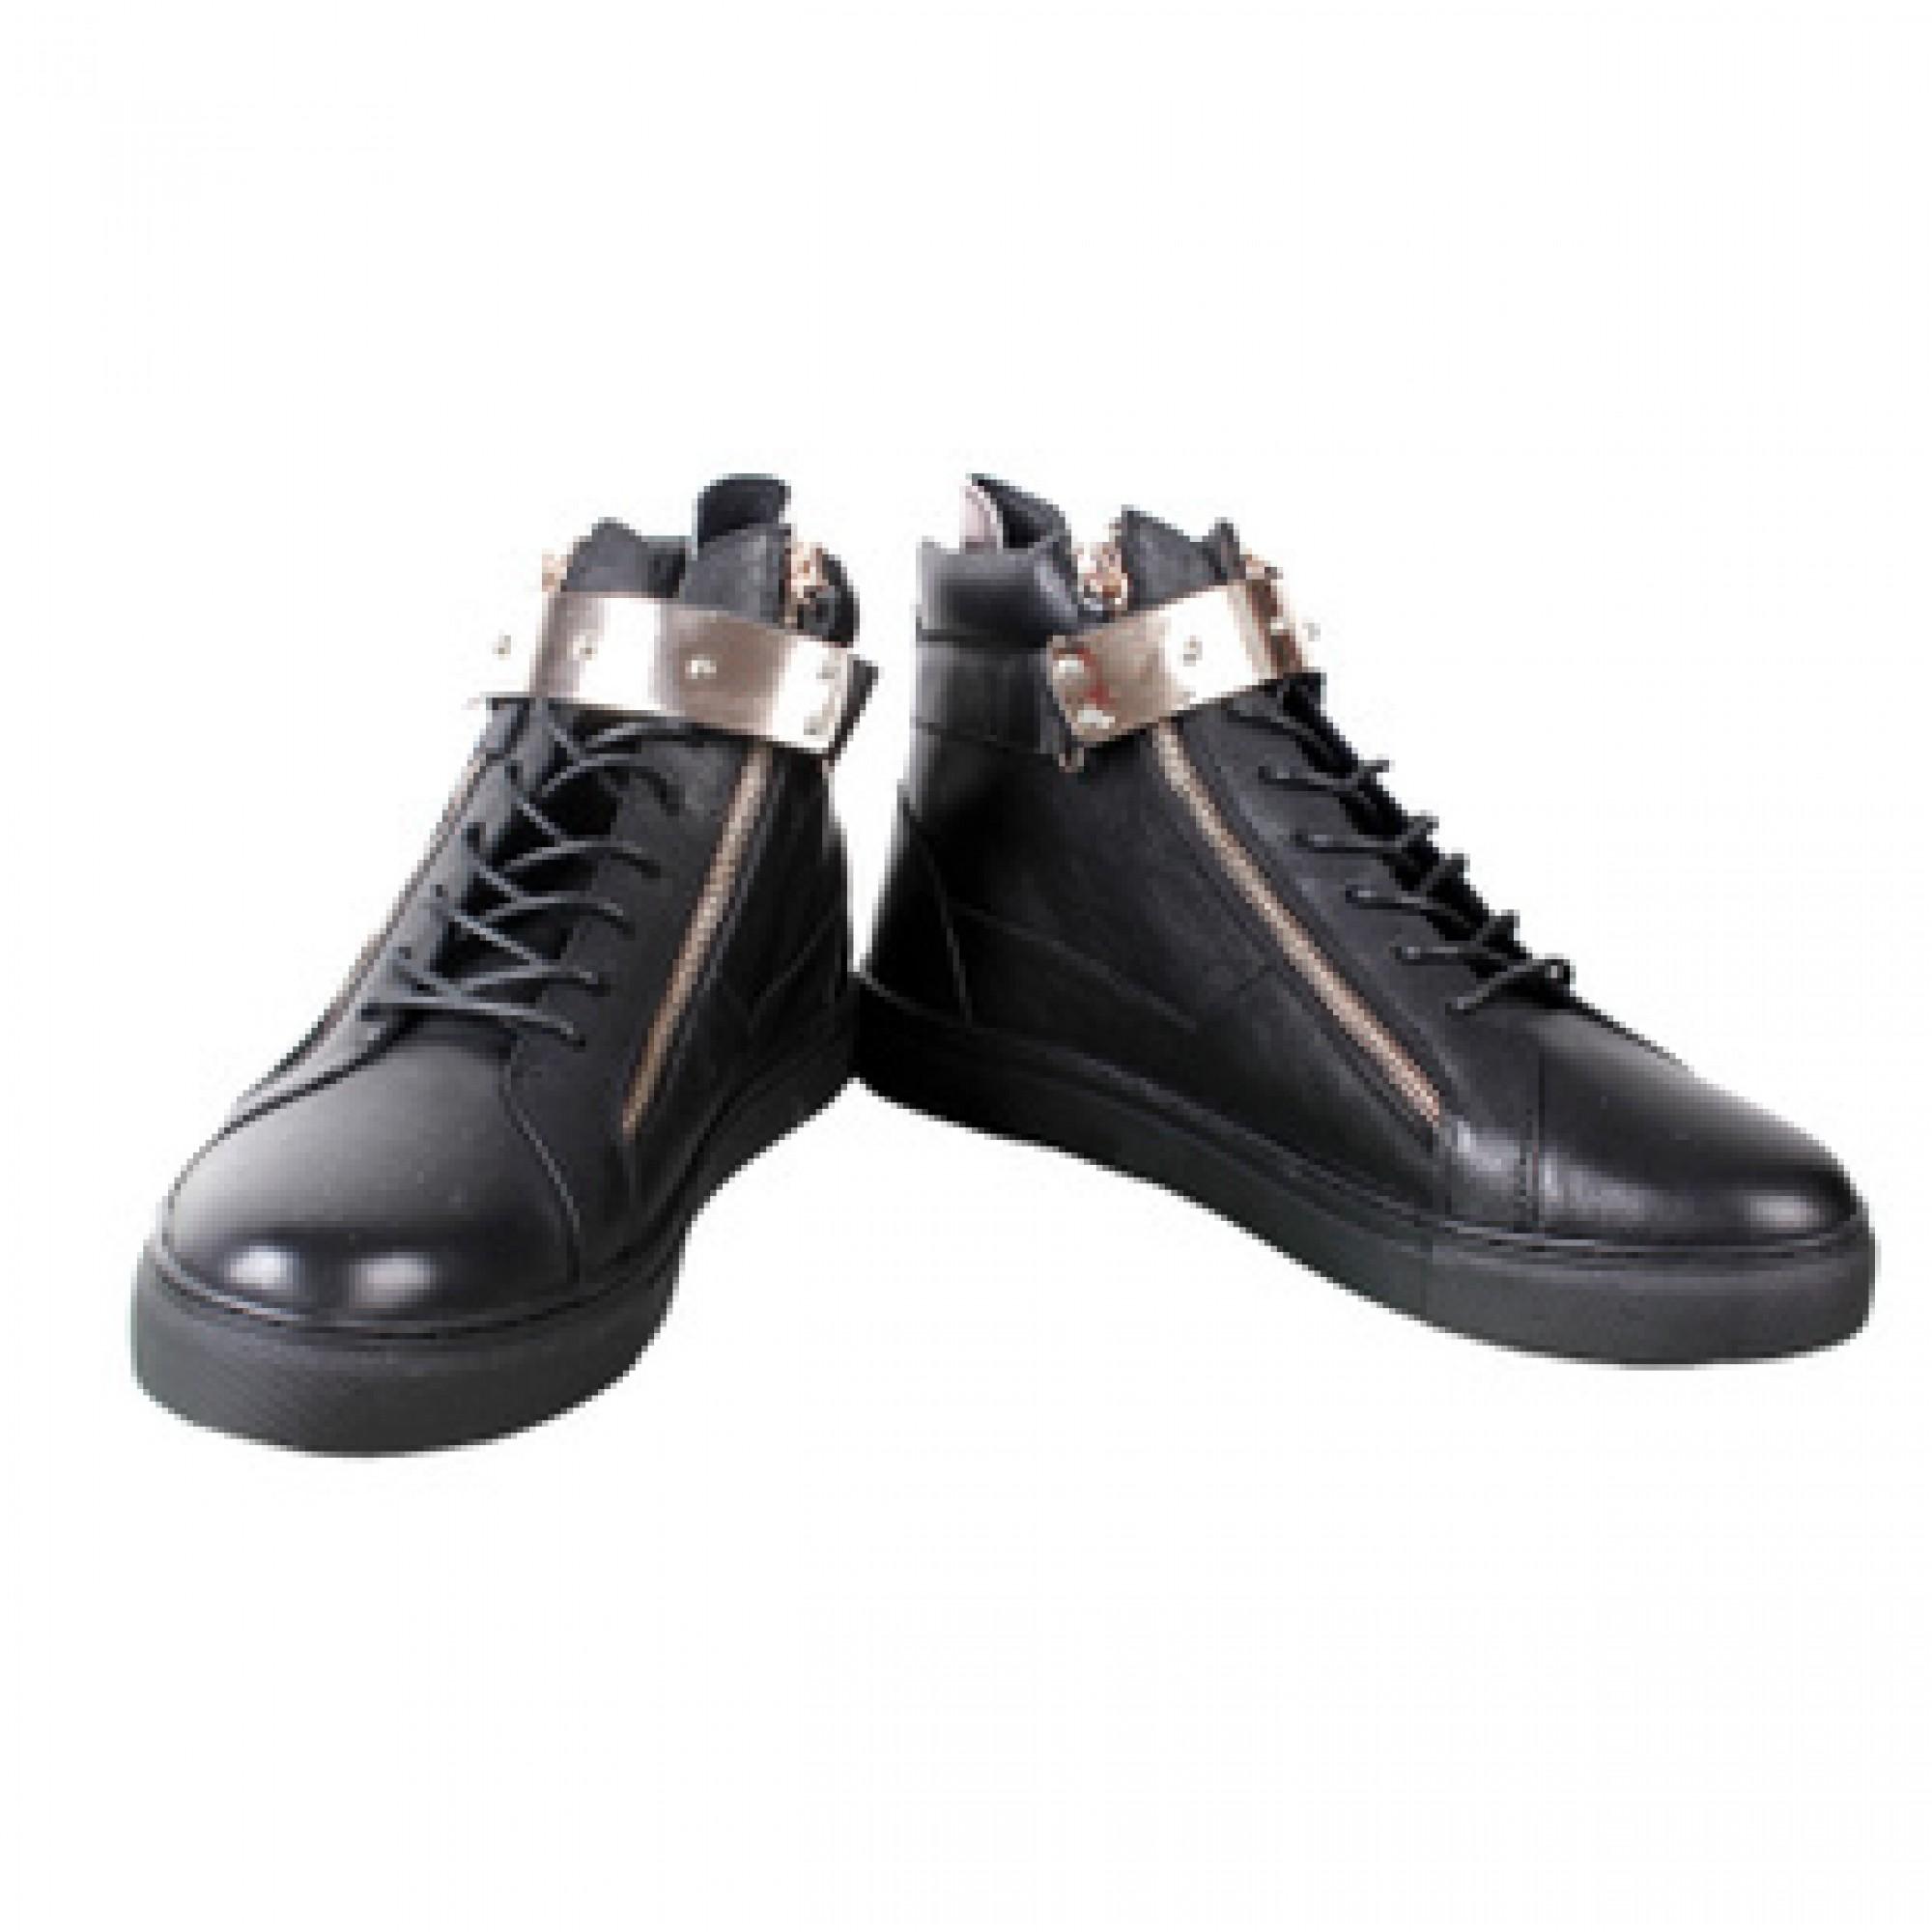 96a806d4 Купить мужские Giuseppe Zanotti Sneakers — в Киеве, код товара 8559